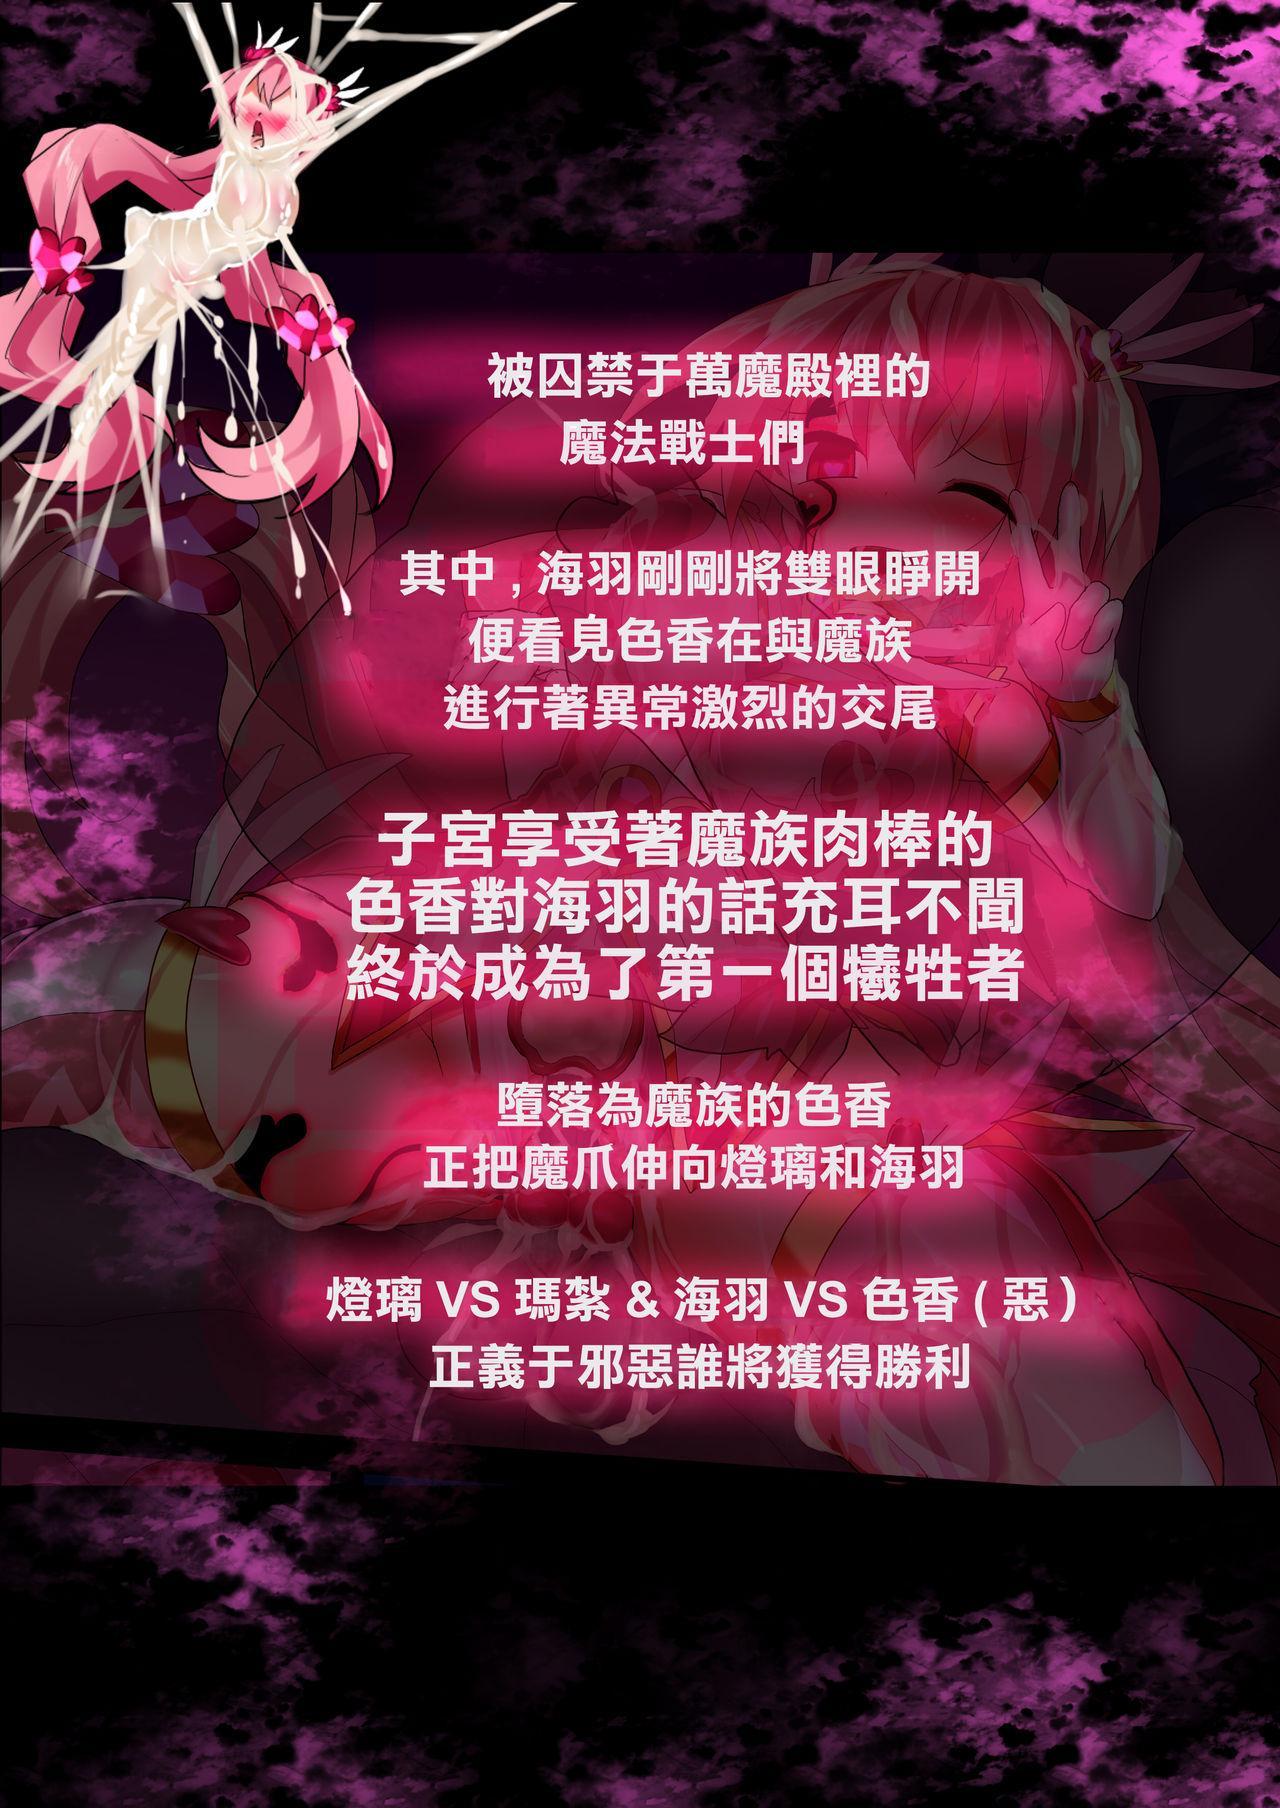 [Makutsutei (Nagai Wataru)] Orgasm Unit EX -Mahou Senshi Akari Ch. 1-5 [Chinese] [这很恶堕 x Lolipoi汉化组] 129